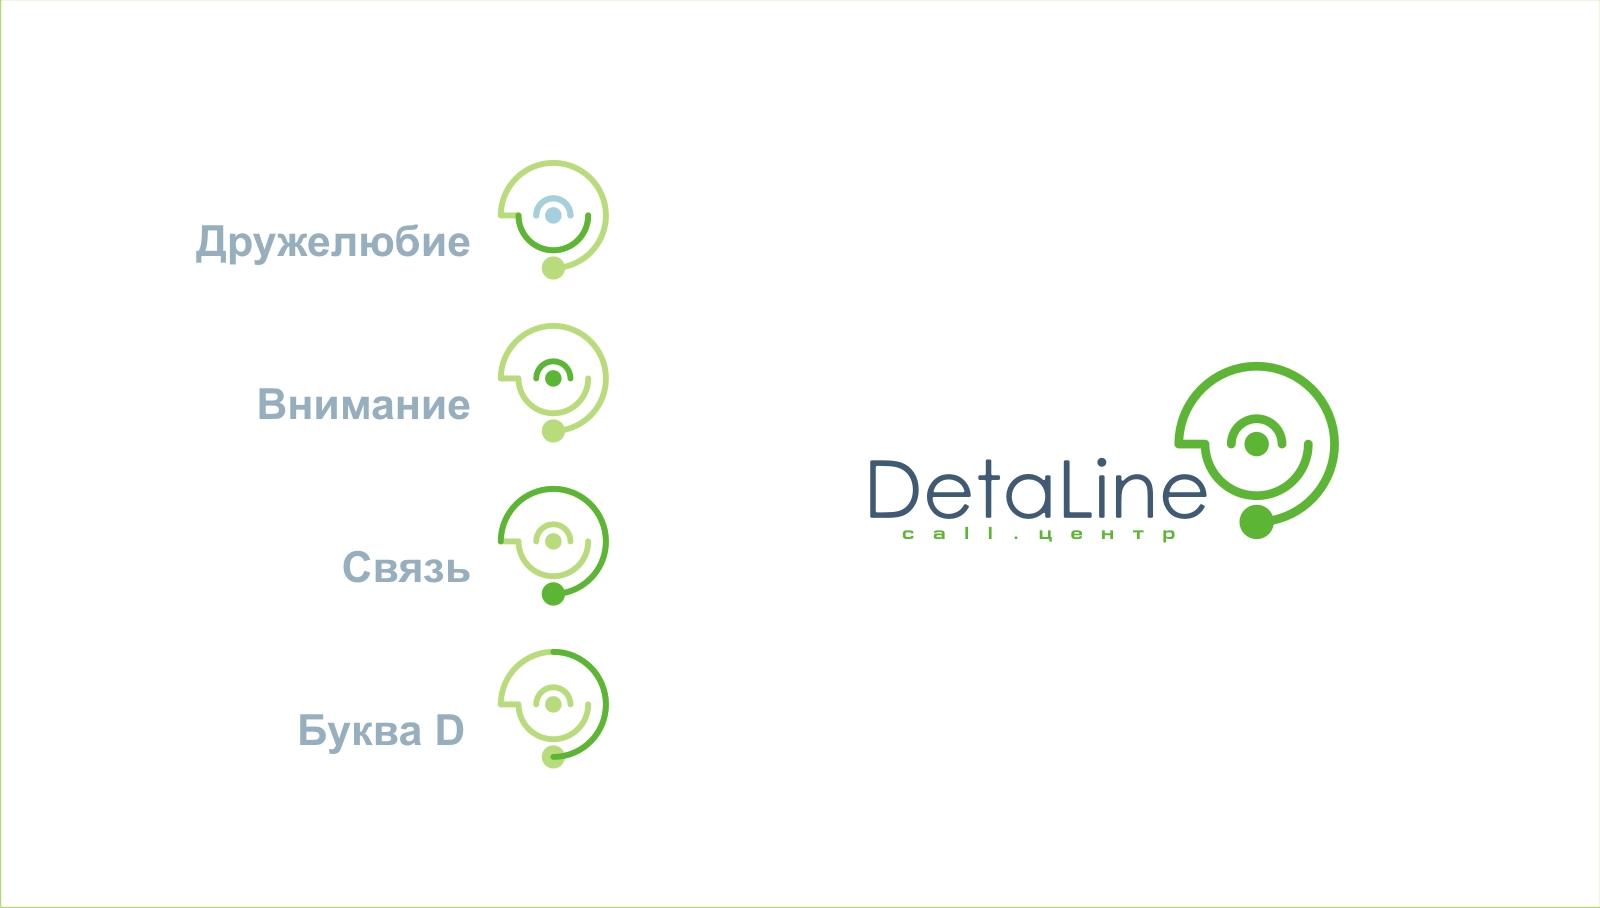 Логотип DetaLine